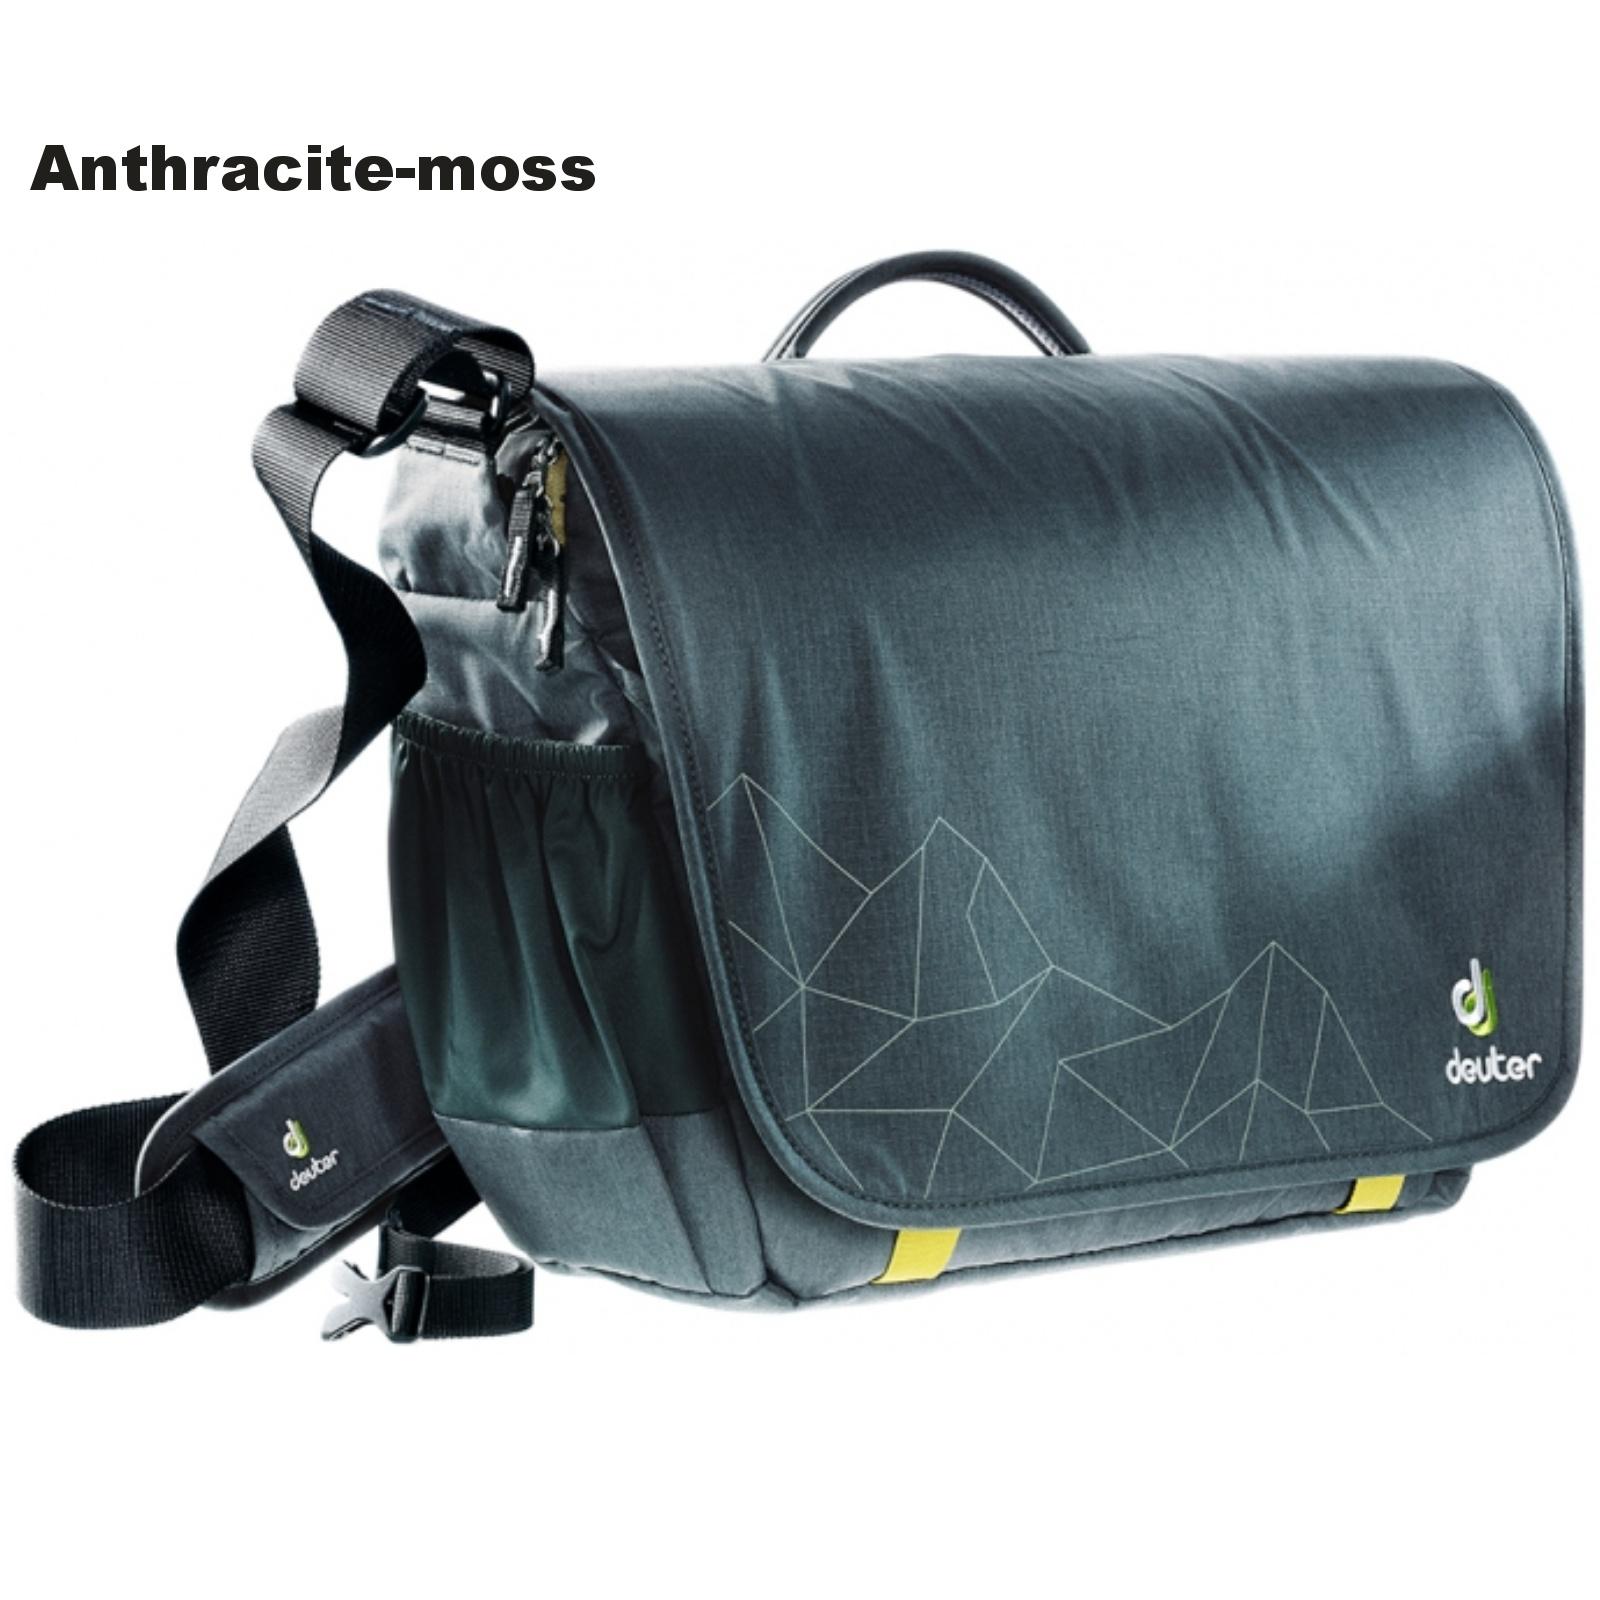 Taška přes rameno DEUTER Operate II - anthracite-moss